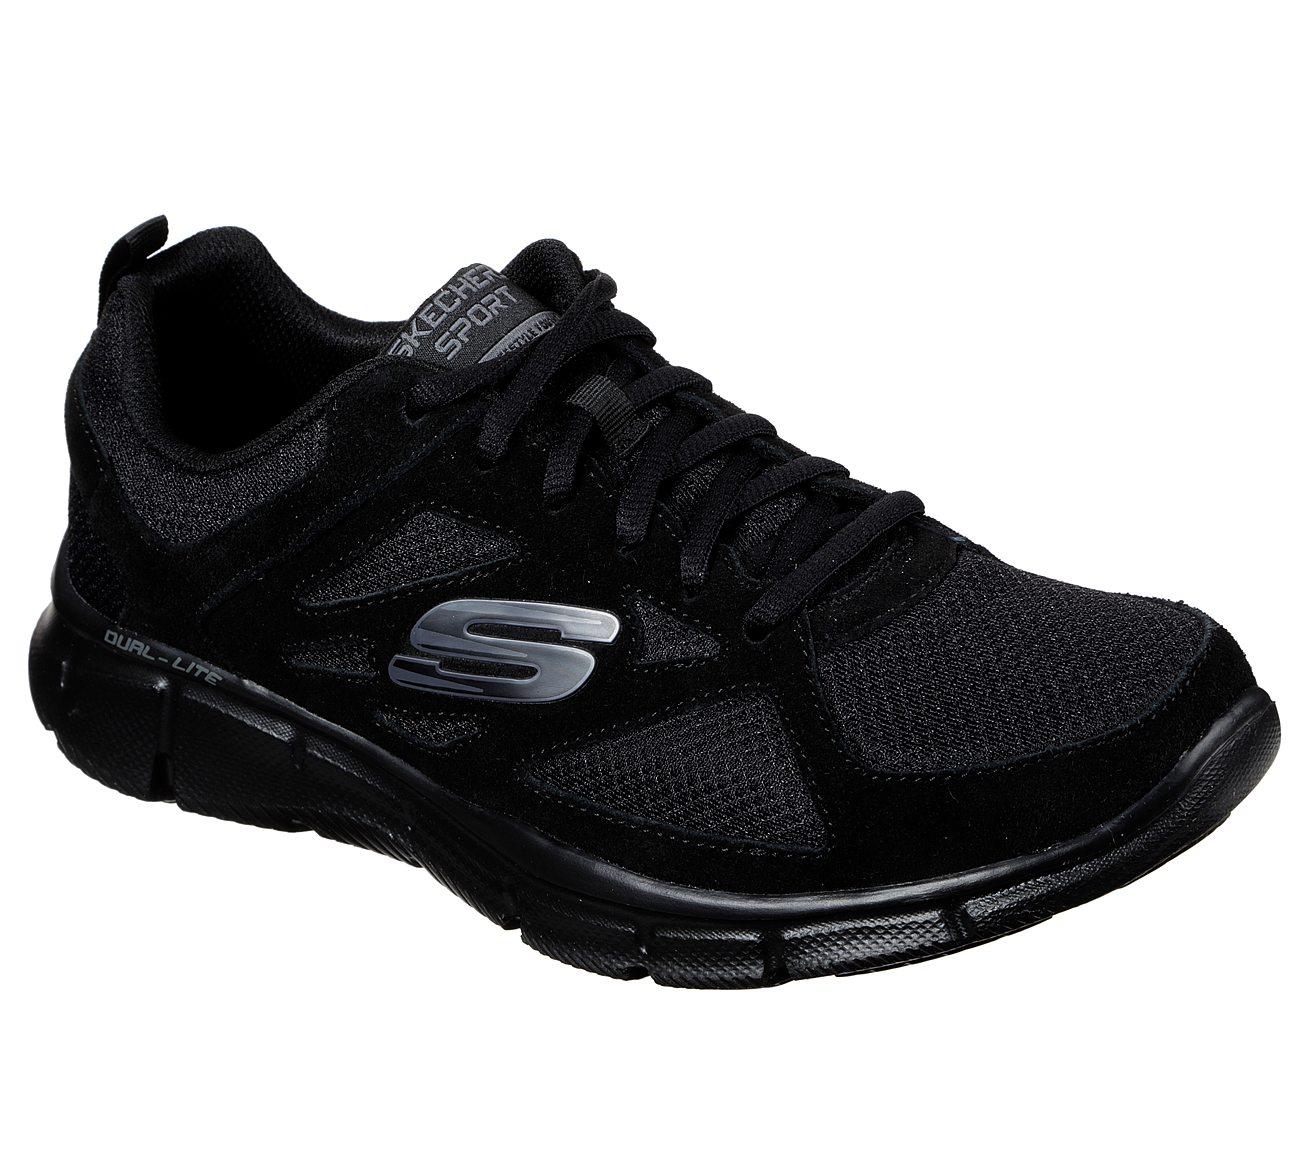 Buy SKECHERS Equalizer - Ezdez Sport Shoes